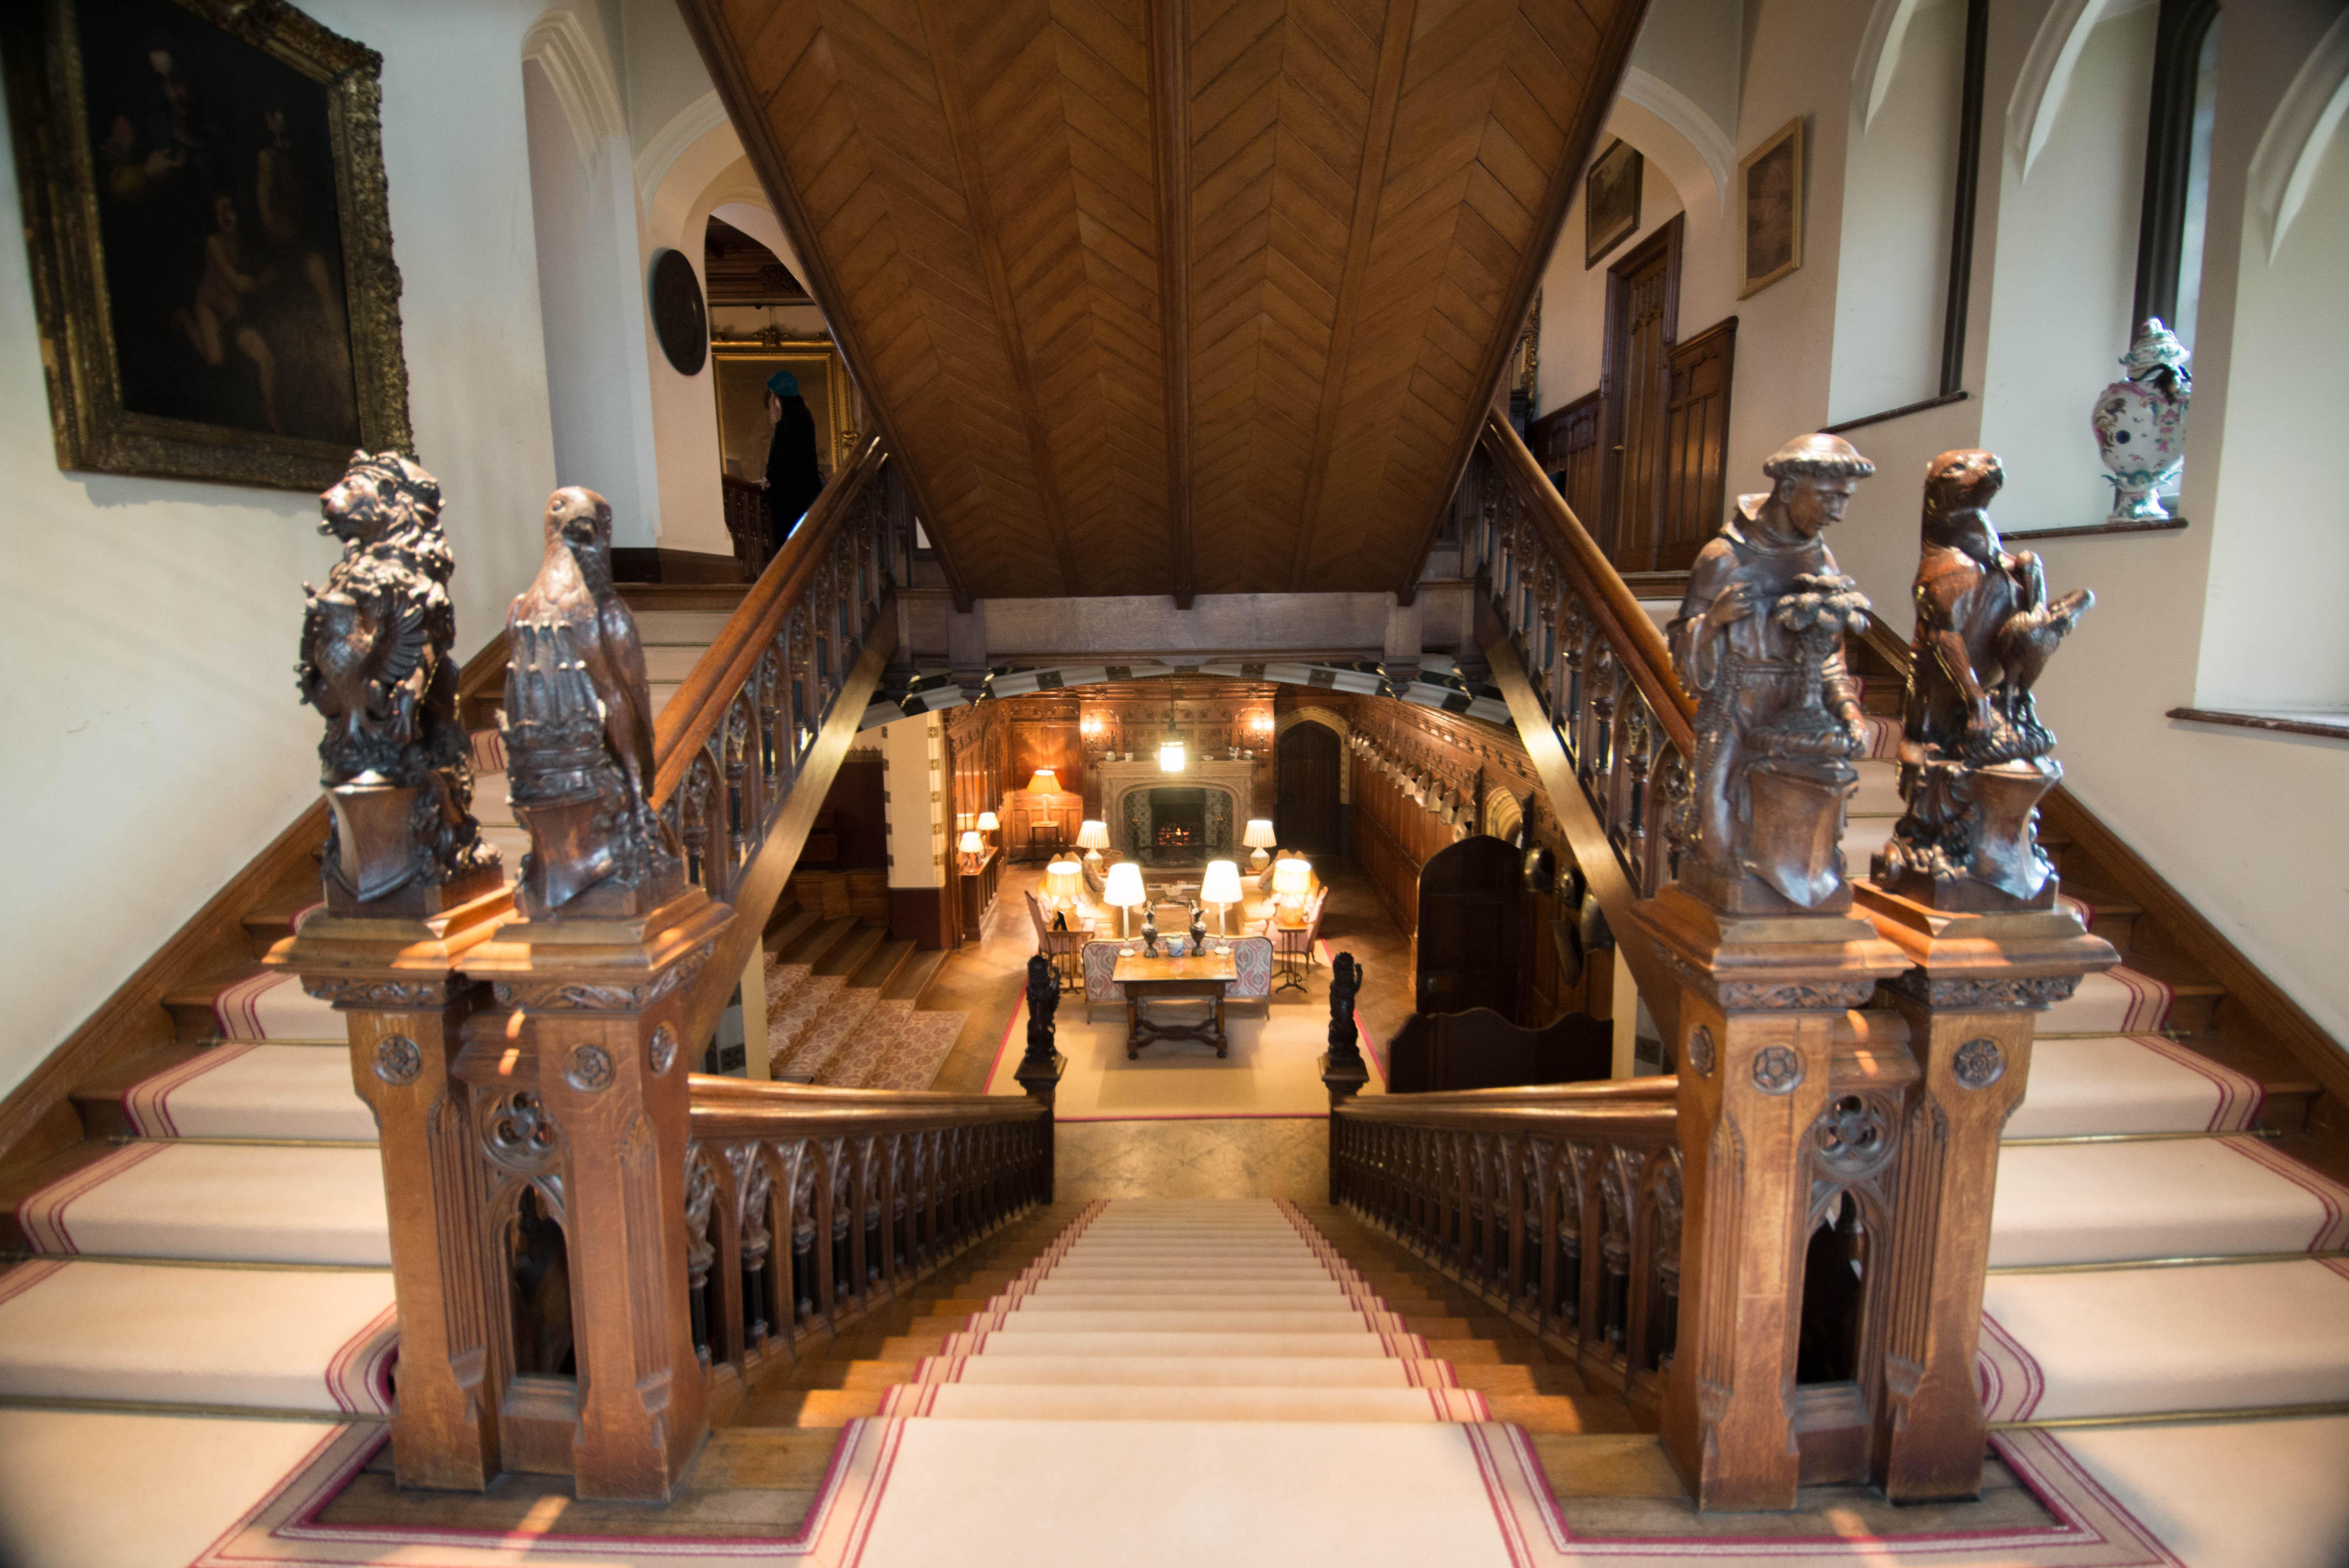 Delightful File:Carlton Towers Interior Staircase